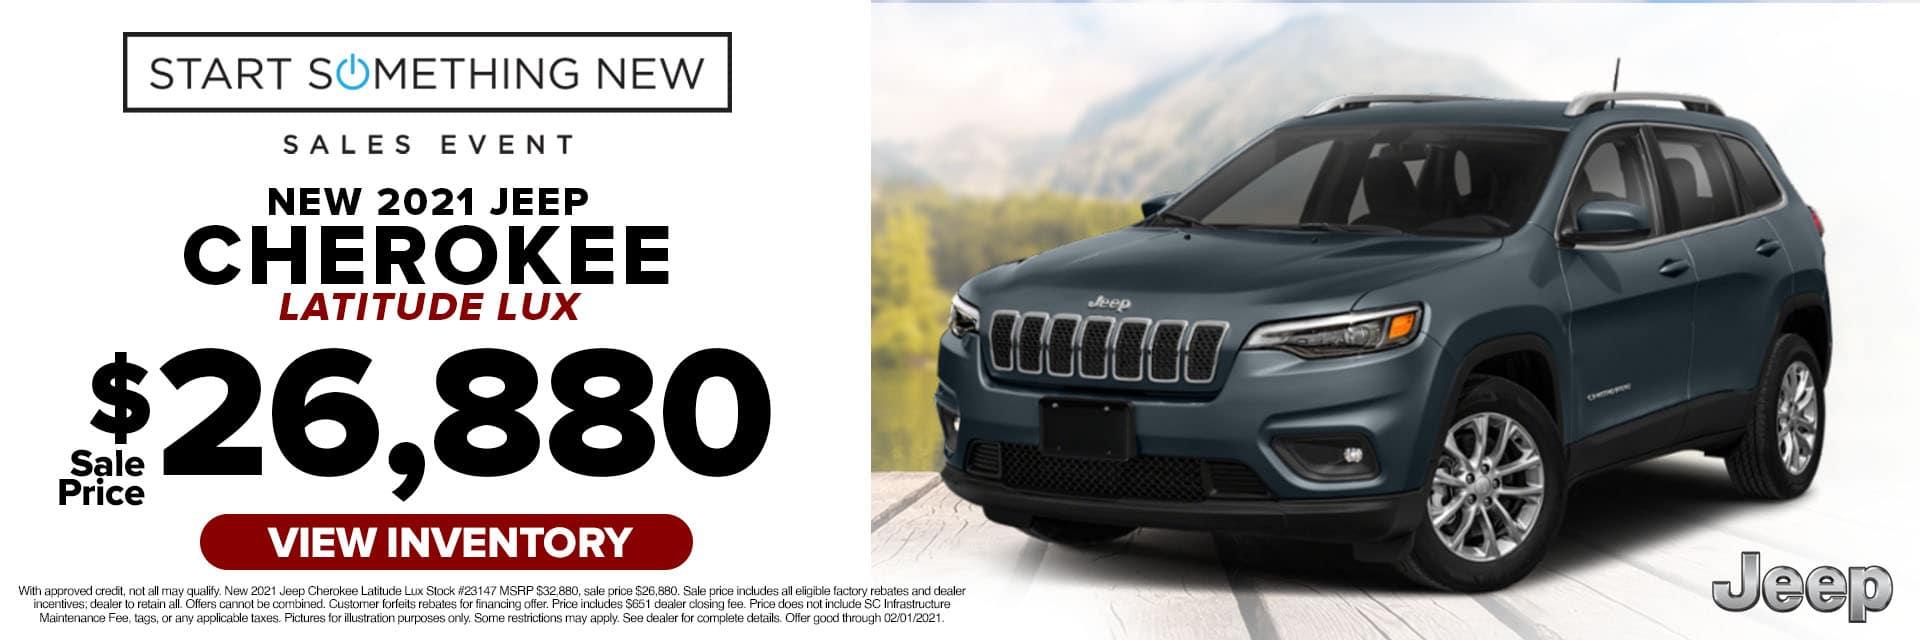 SLCJ-January 2021-2020 Jeep Cherokee